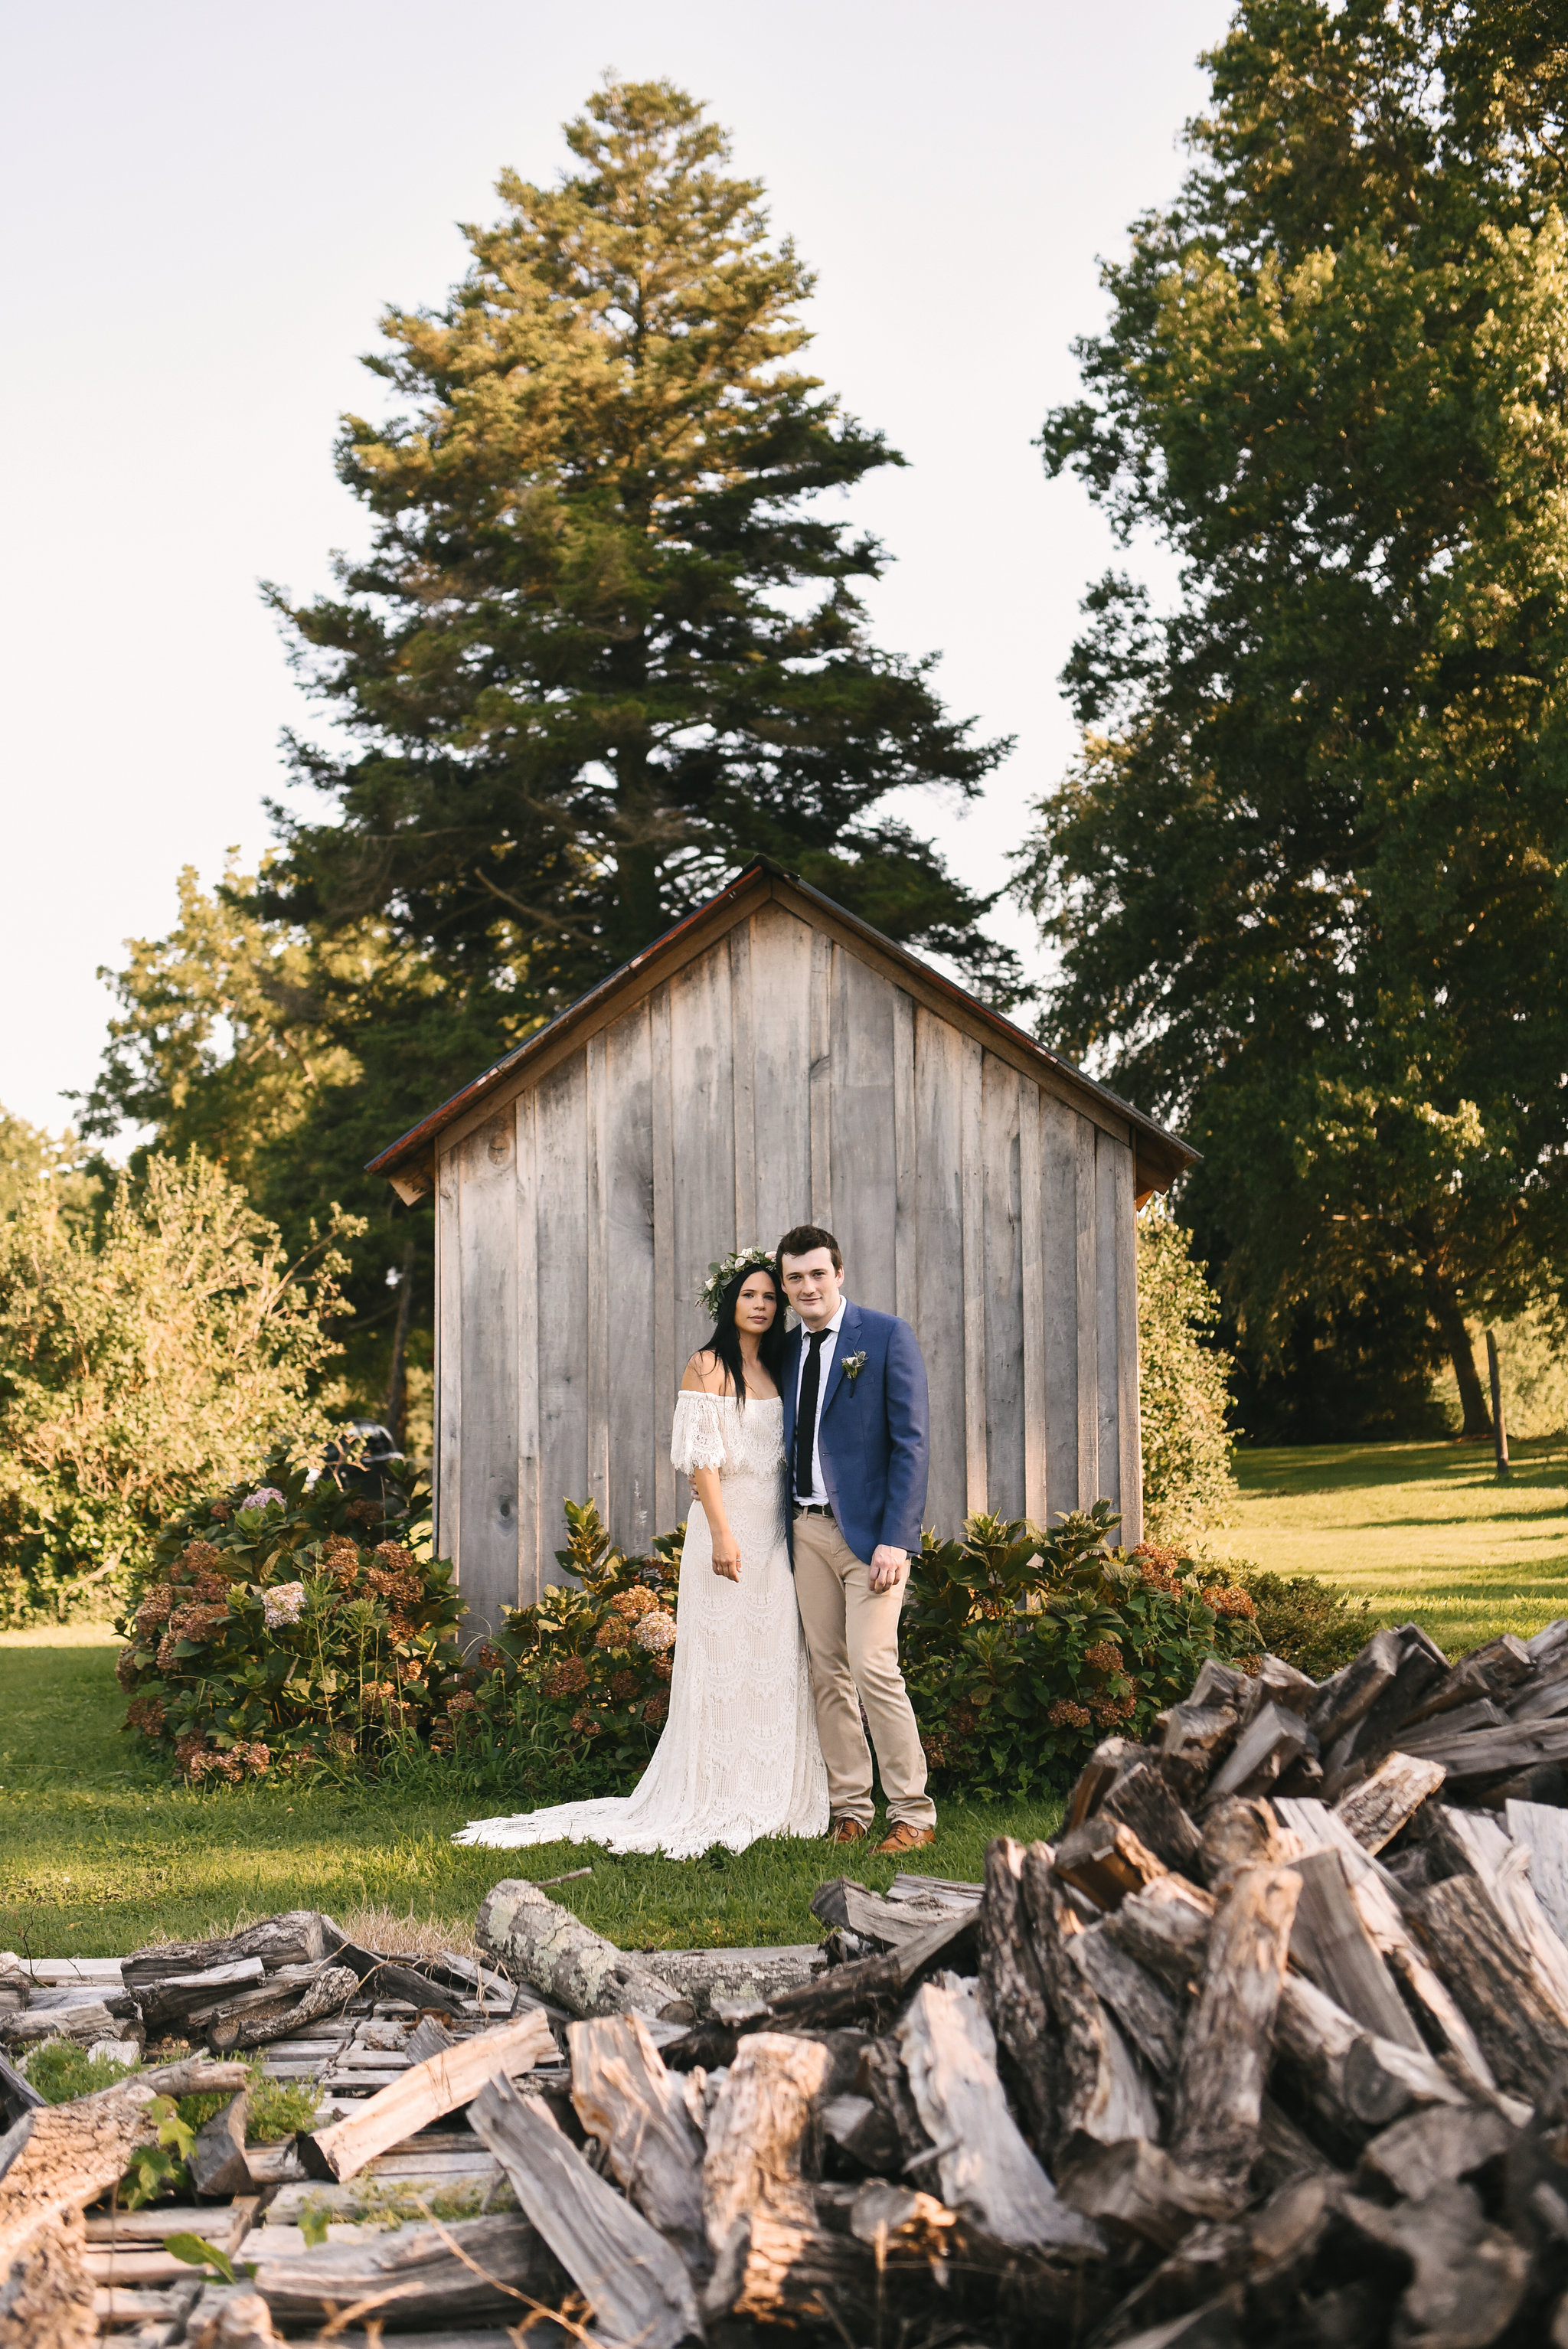 Maryland, Eastern Shore, Baltimore Wedding Photographer, Romantic, Boho, Backyard Wedding, Nature, Portrait of Bride and Groom, Daughters of Simone Wedding Dress